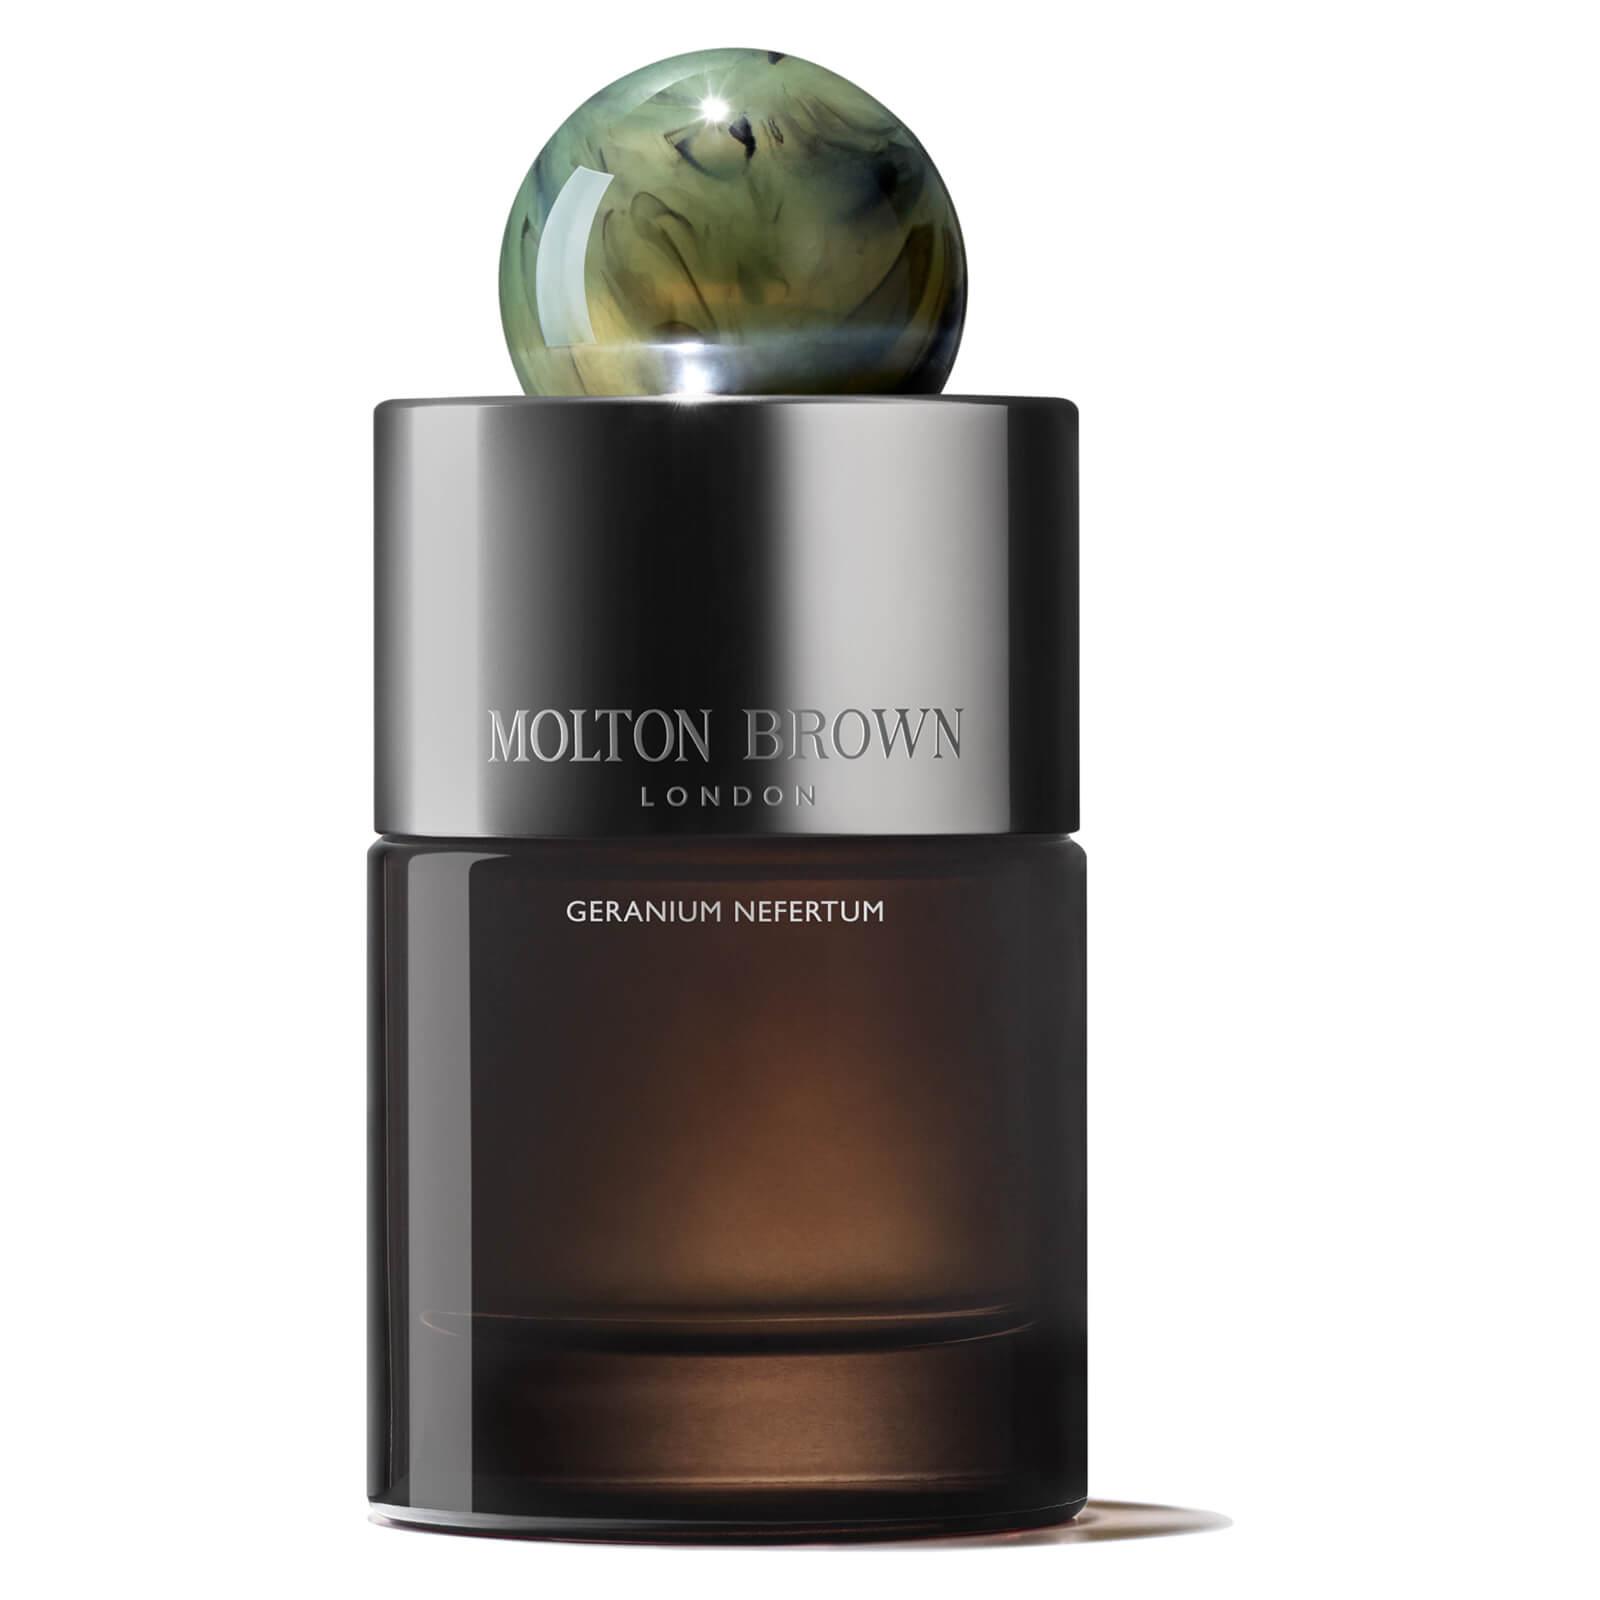 Molton Brown Geranium Nefertum Eau de Parfum 100ml